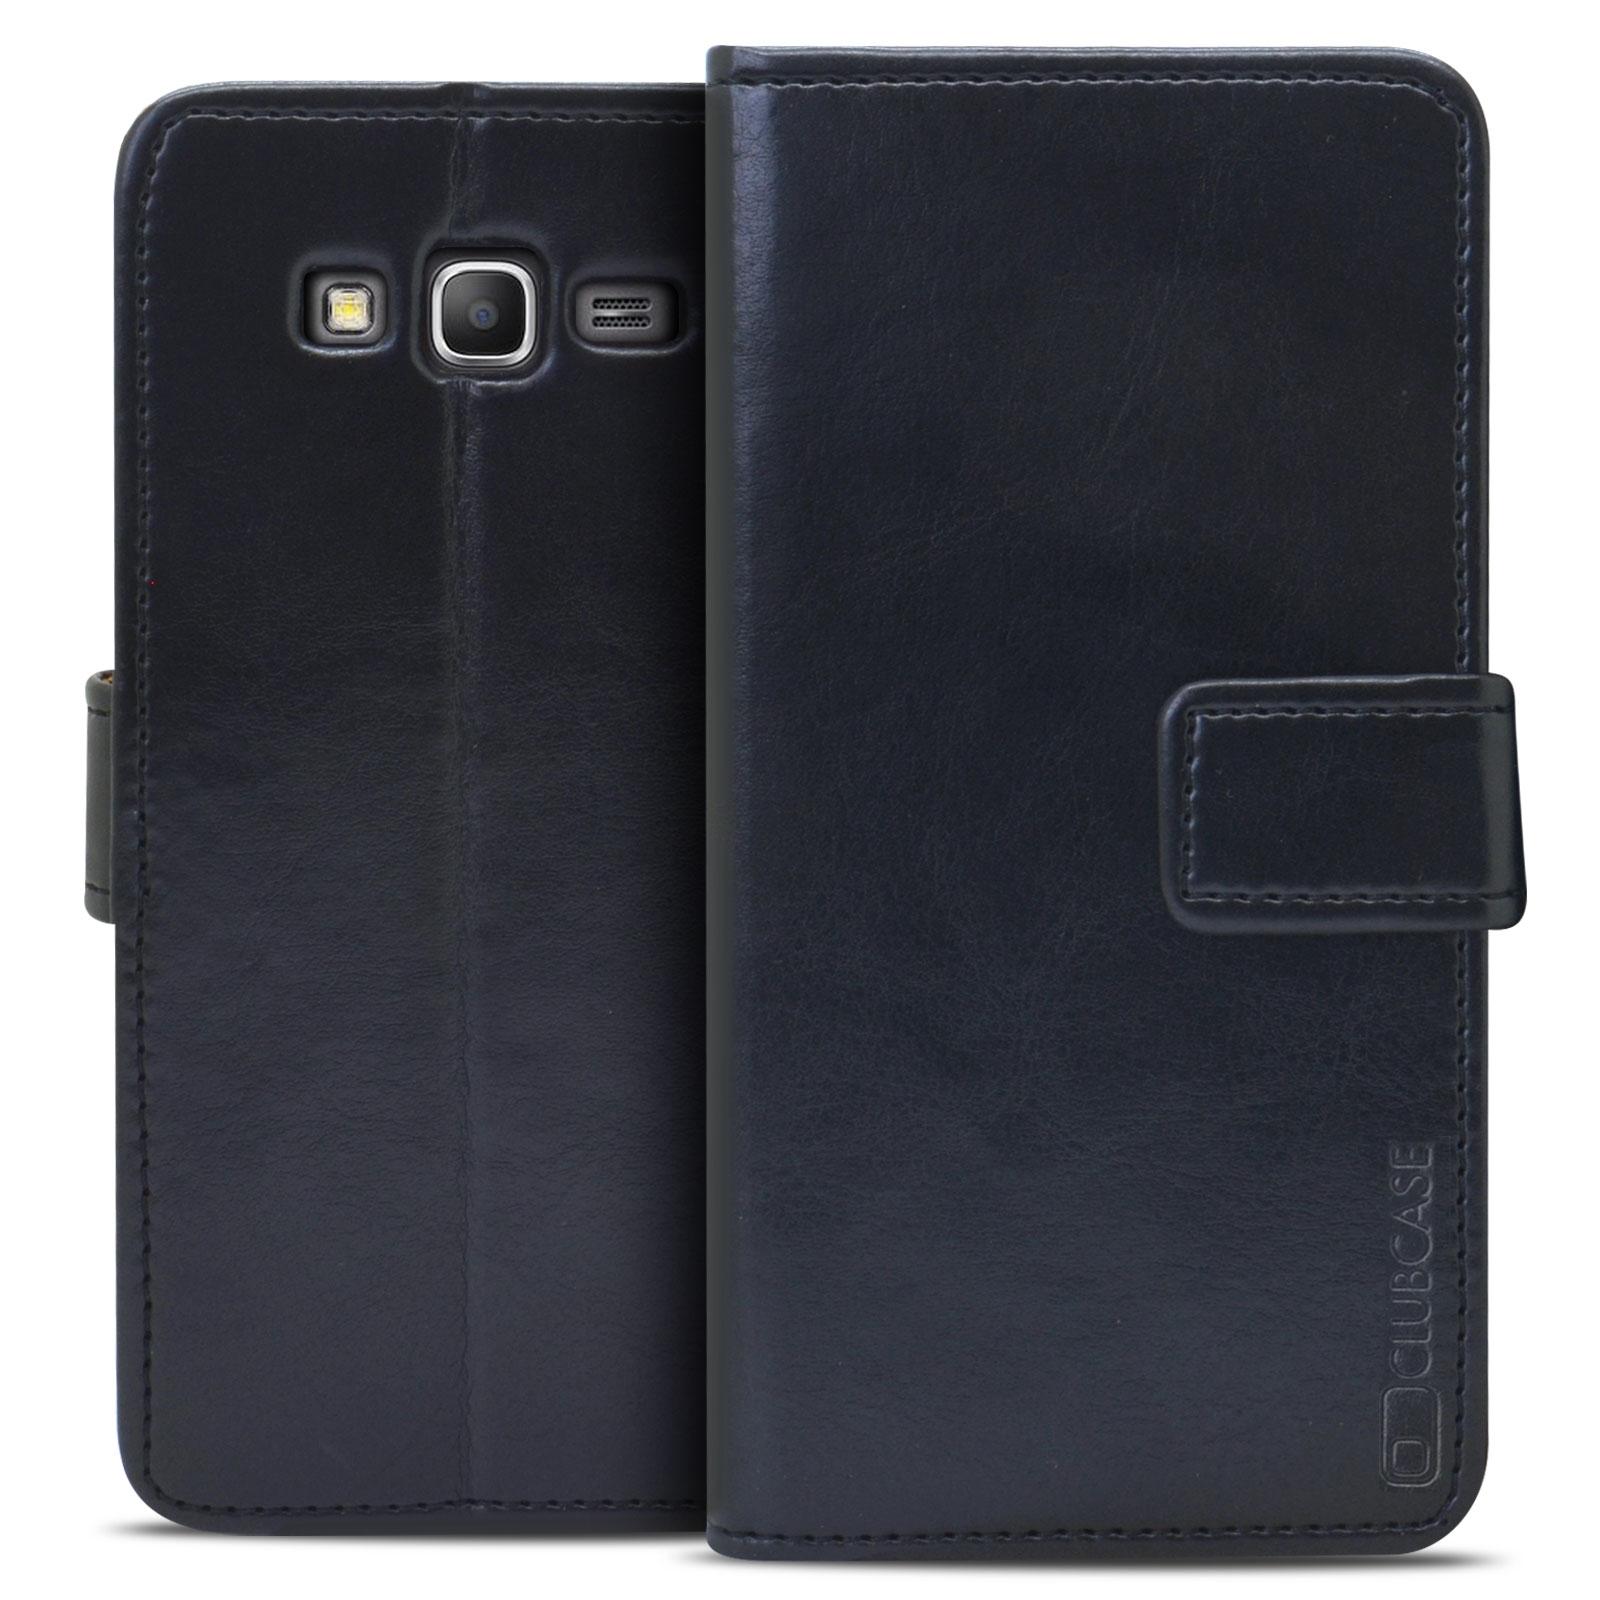 Coque Folio Stand Souple Samsung Galaxy Grand Prime Cuir Véritable ...